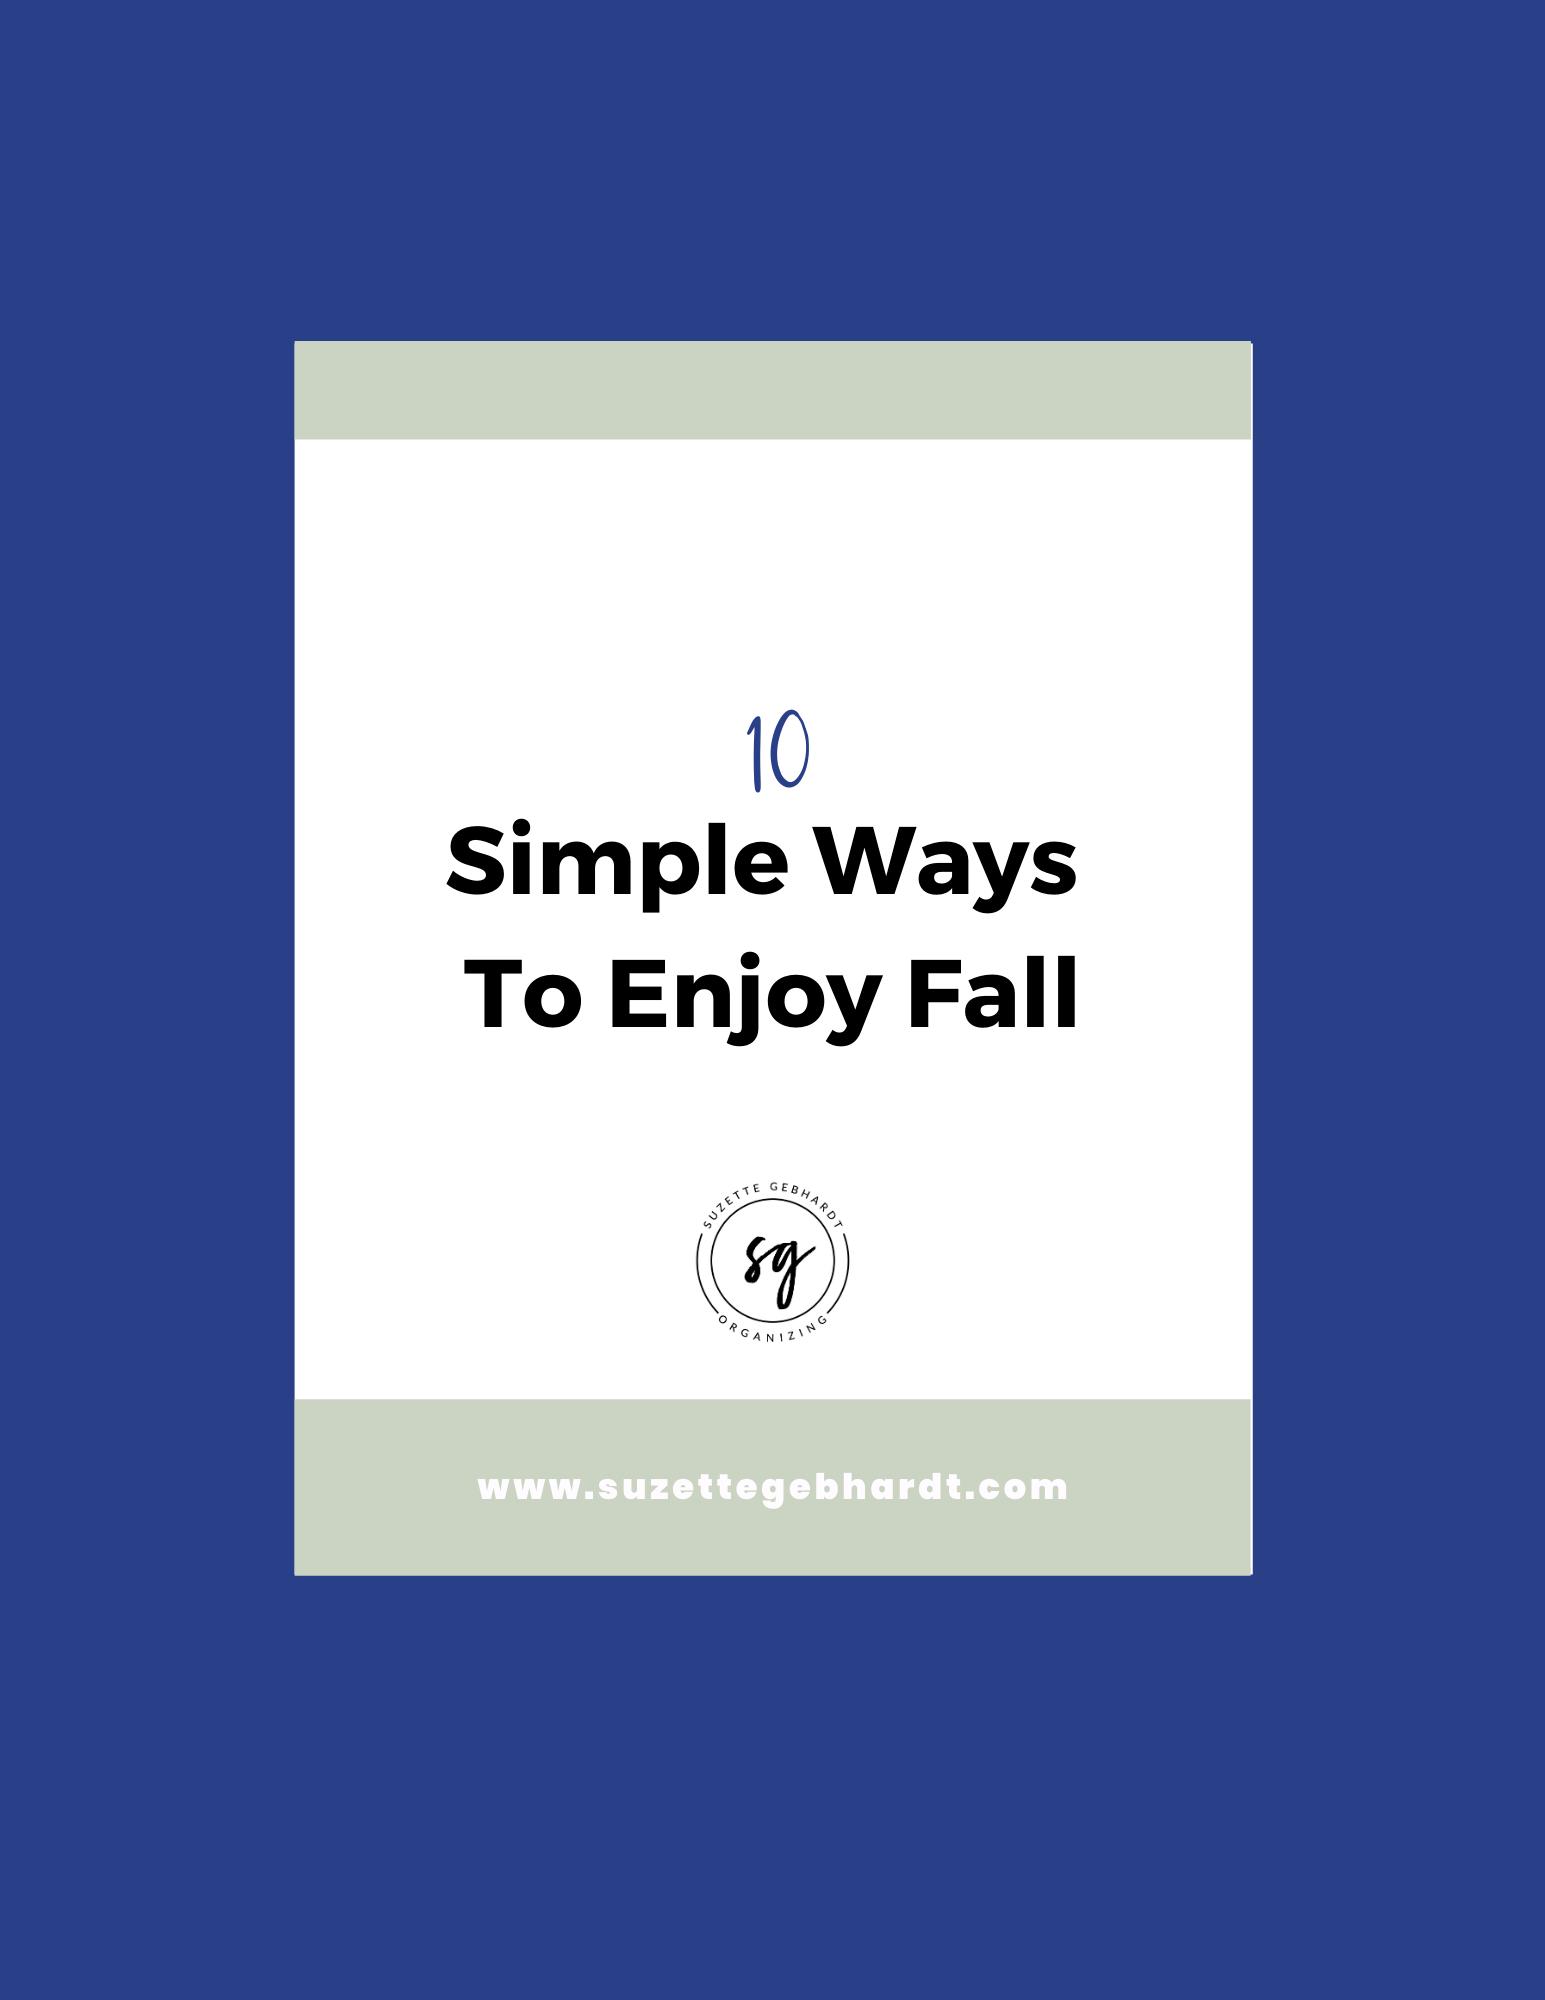 10 Simple Ways to Enjoy Fall